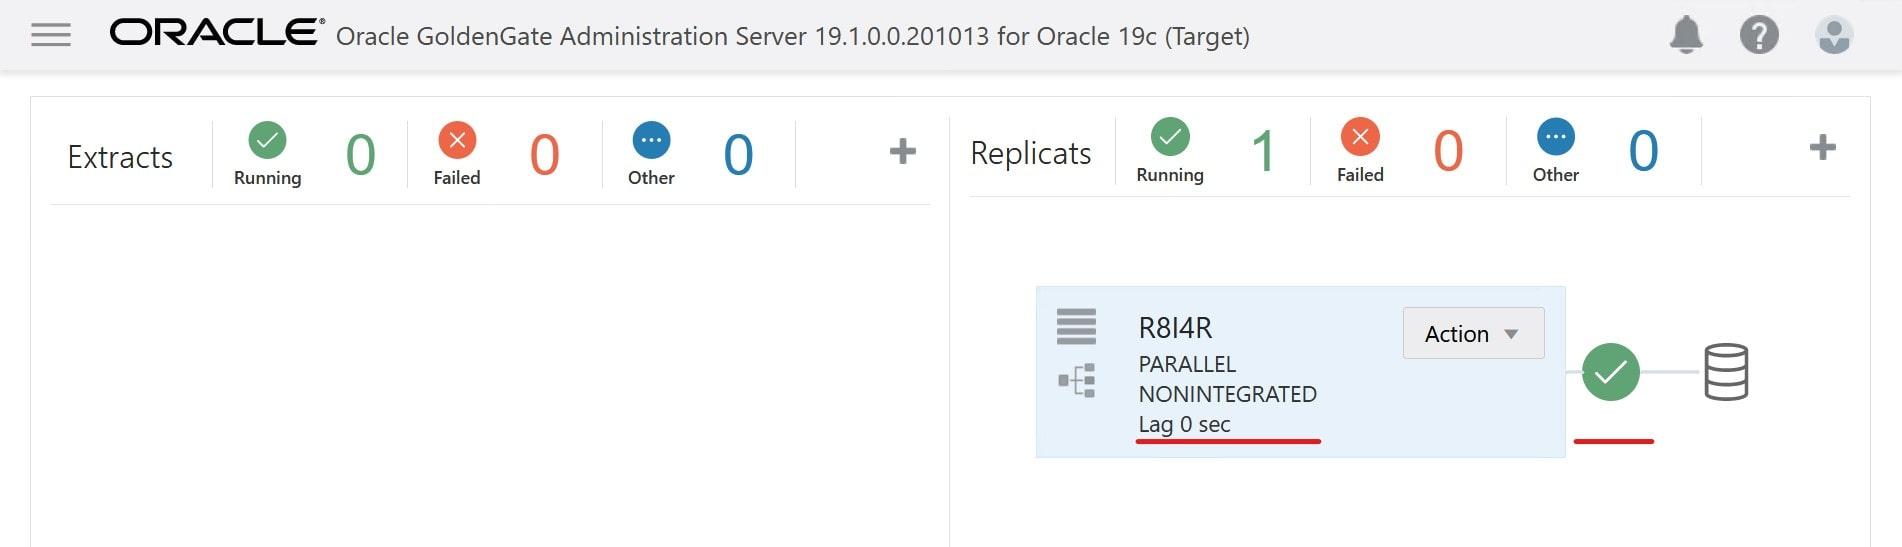 Ensure replicat process is running